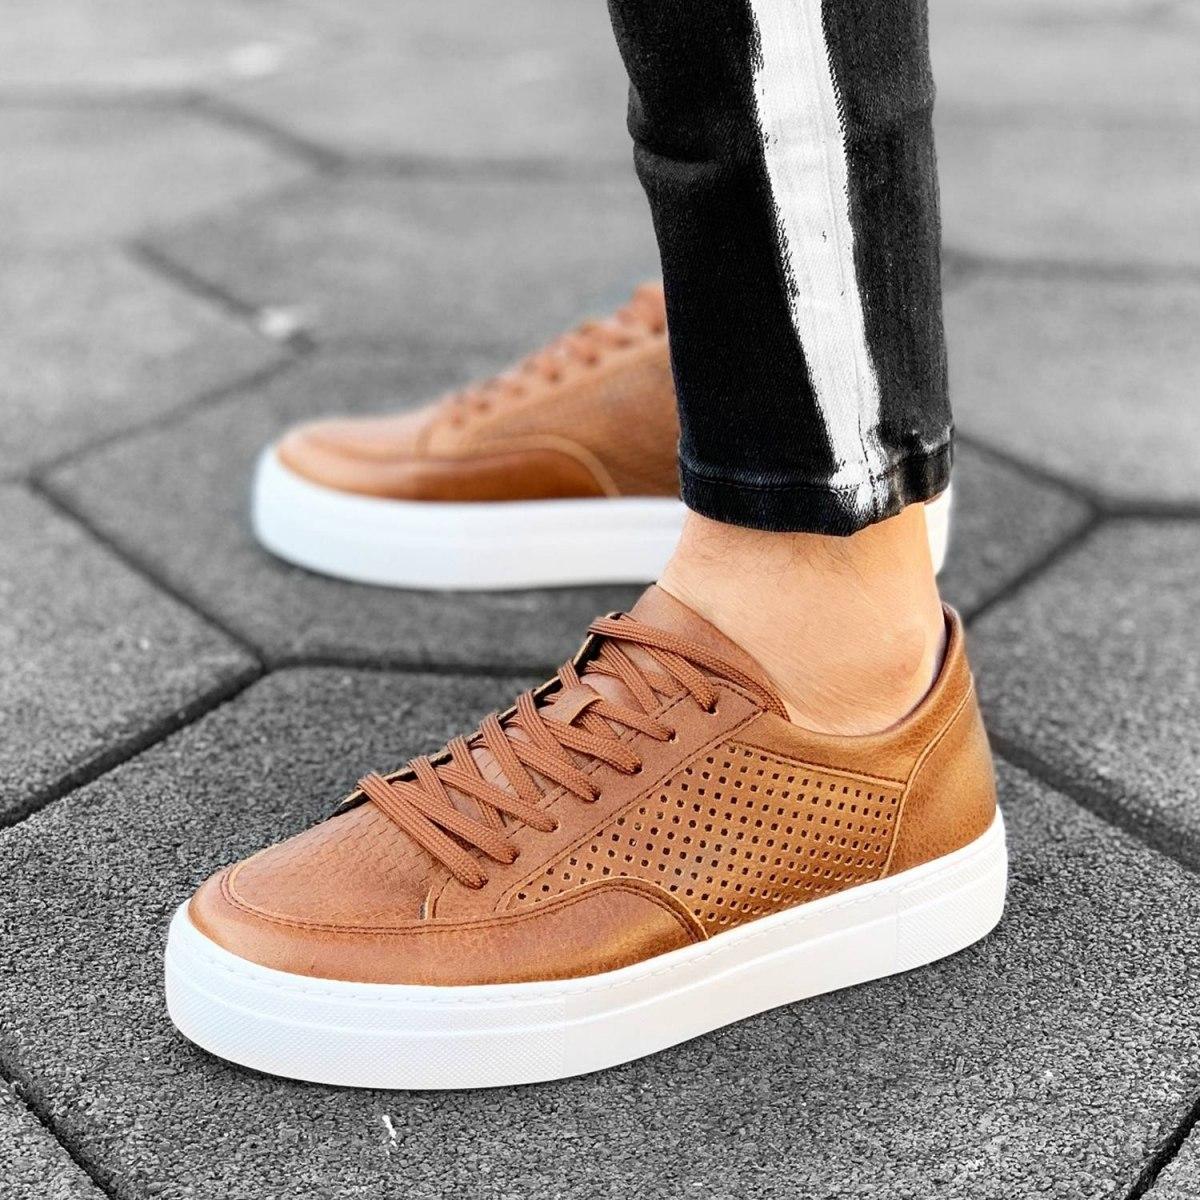 Herren Plexus Sneakers In Braun-Weiß Mv Premium Brand - 1